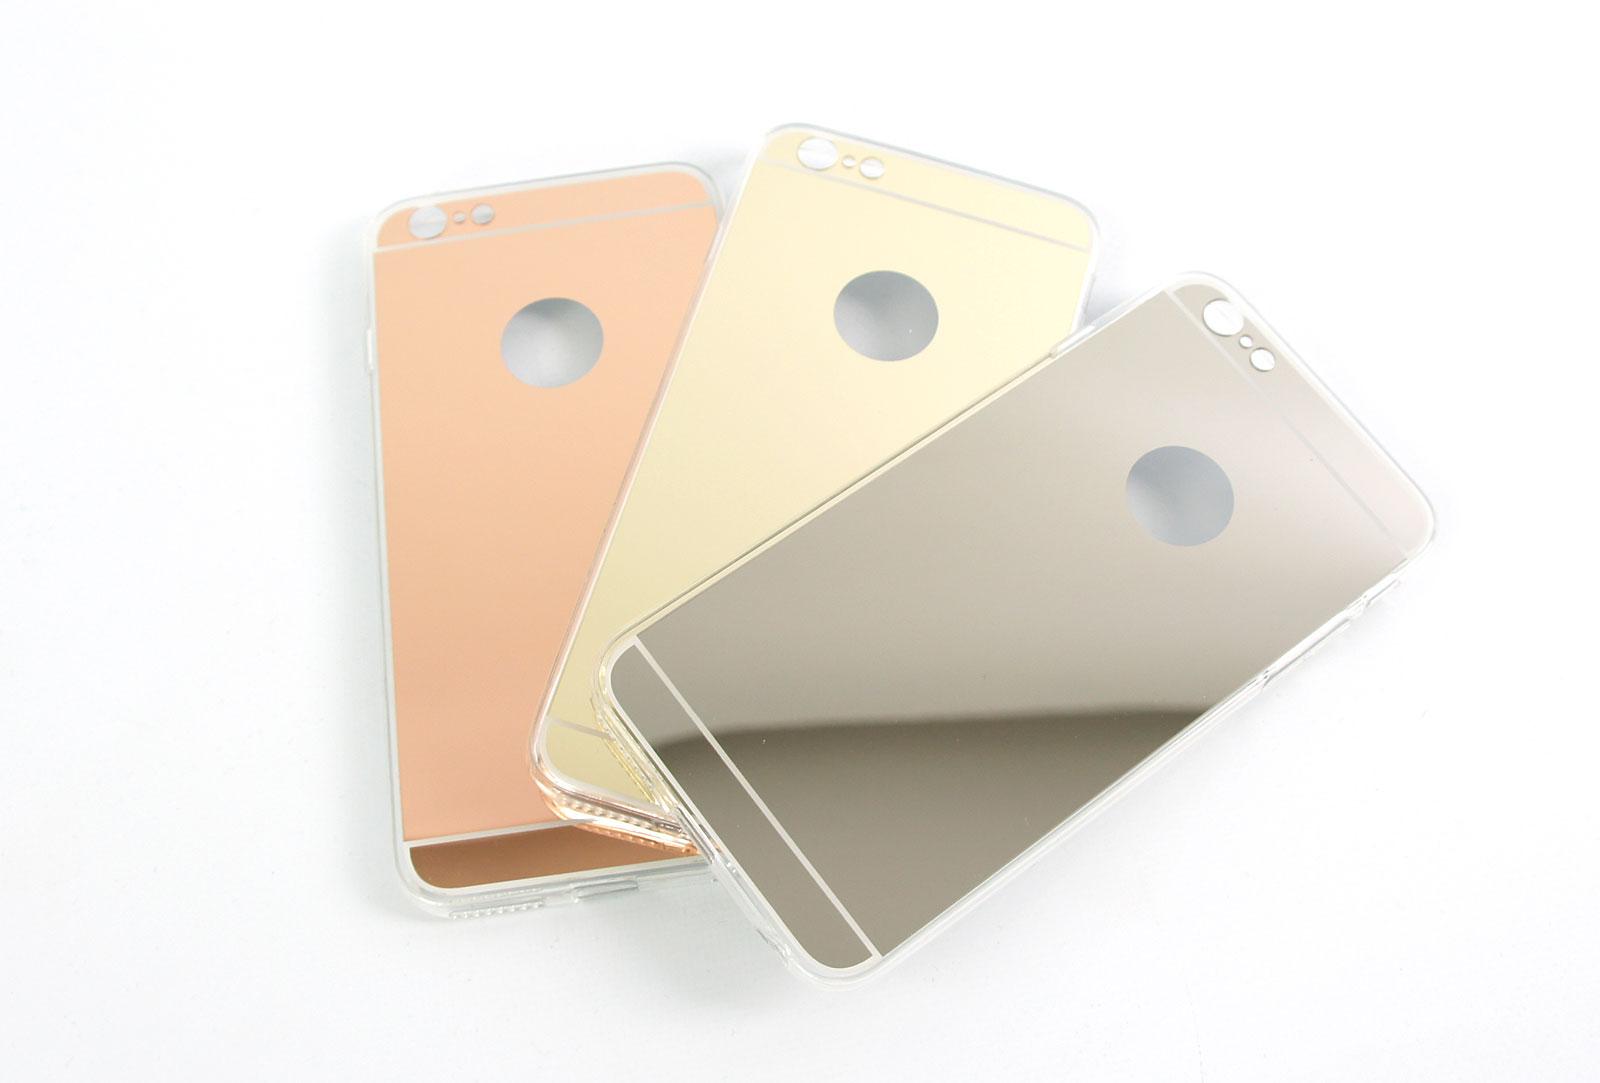 Coque slim miroir or pour iphone 6 s plus et iphone 6 plus for Application miroir pour iphone